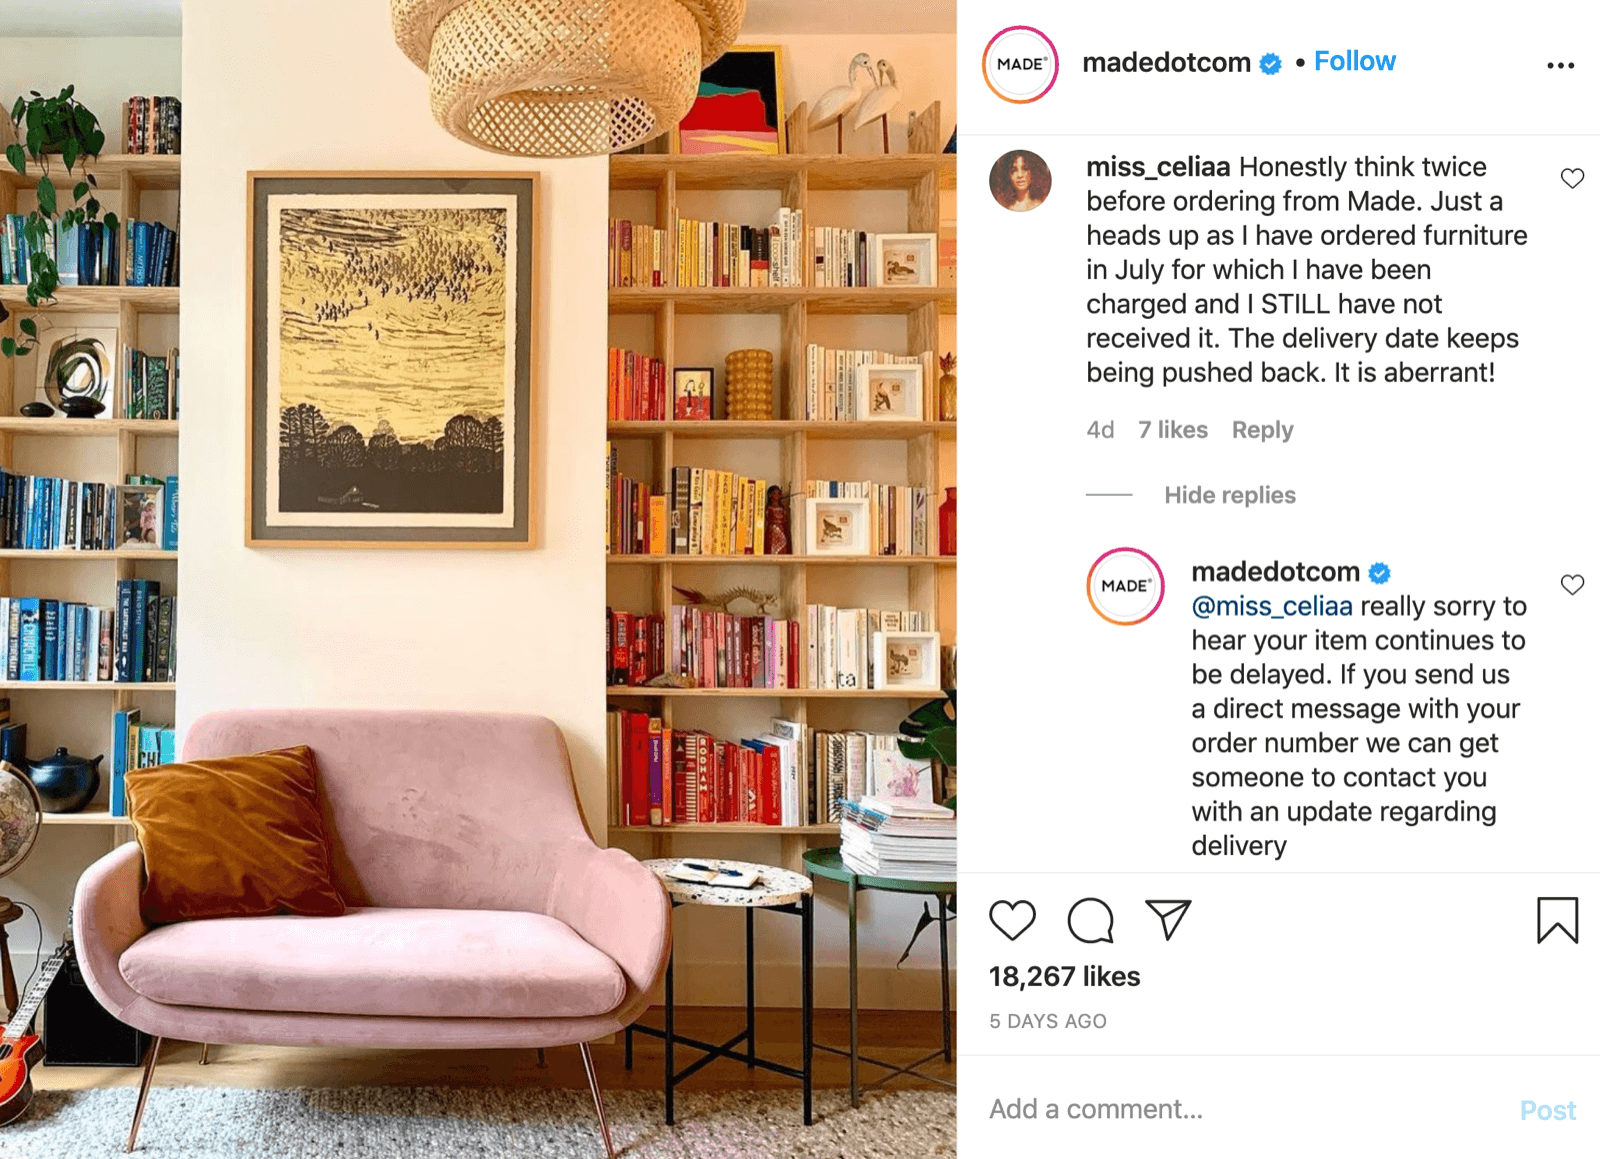 madedotcom Instagram business page